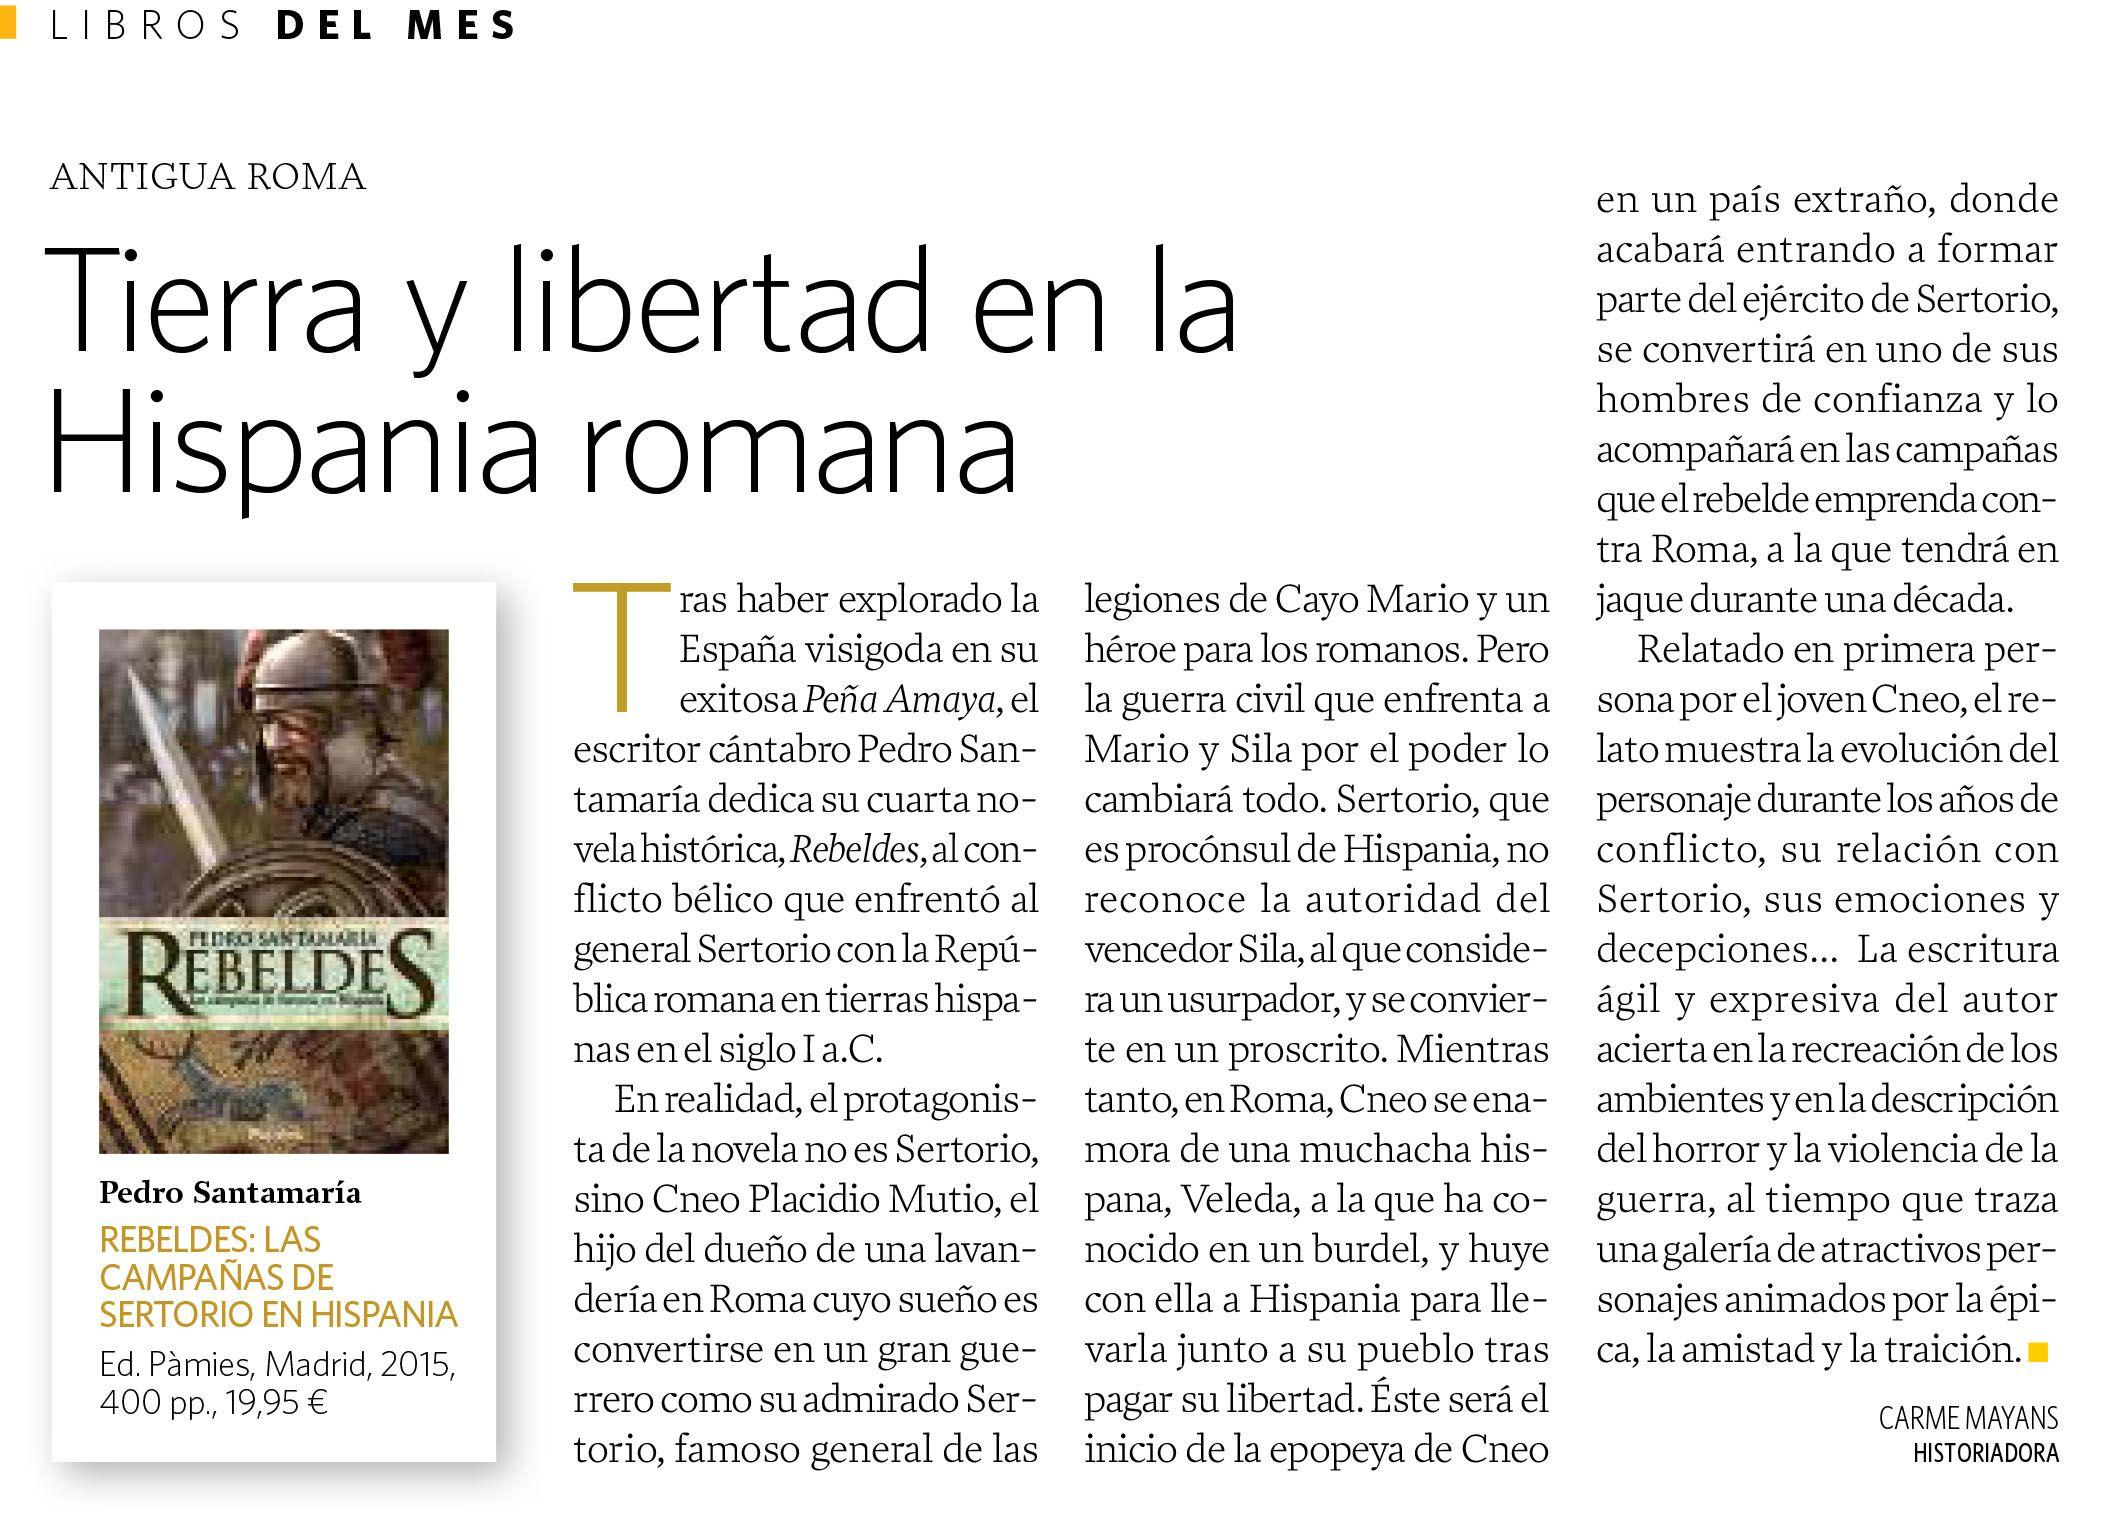 ¡REBELDES de Pedro Santamaría en National Geographic!  #Cantabria #cántabros #ciervablanca #Hispania #Huesca #noveladeromanos #novelahistórica #Pàmies #PedroSantamaría #Rebeldes #Sertorio